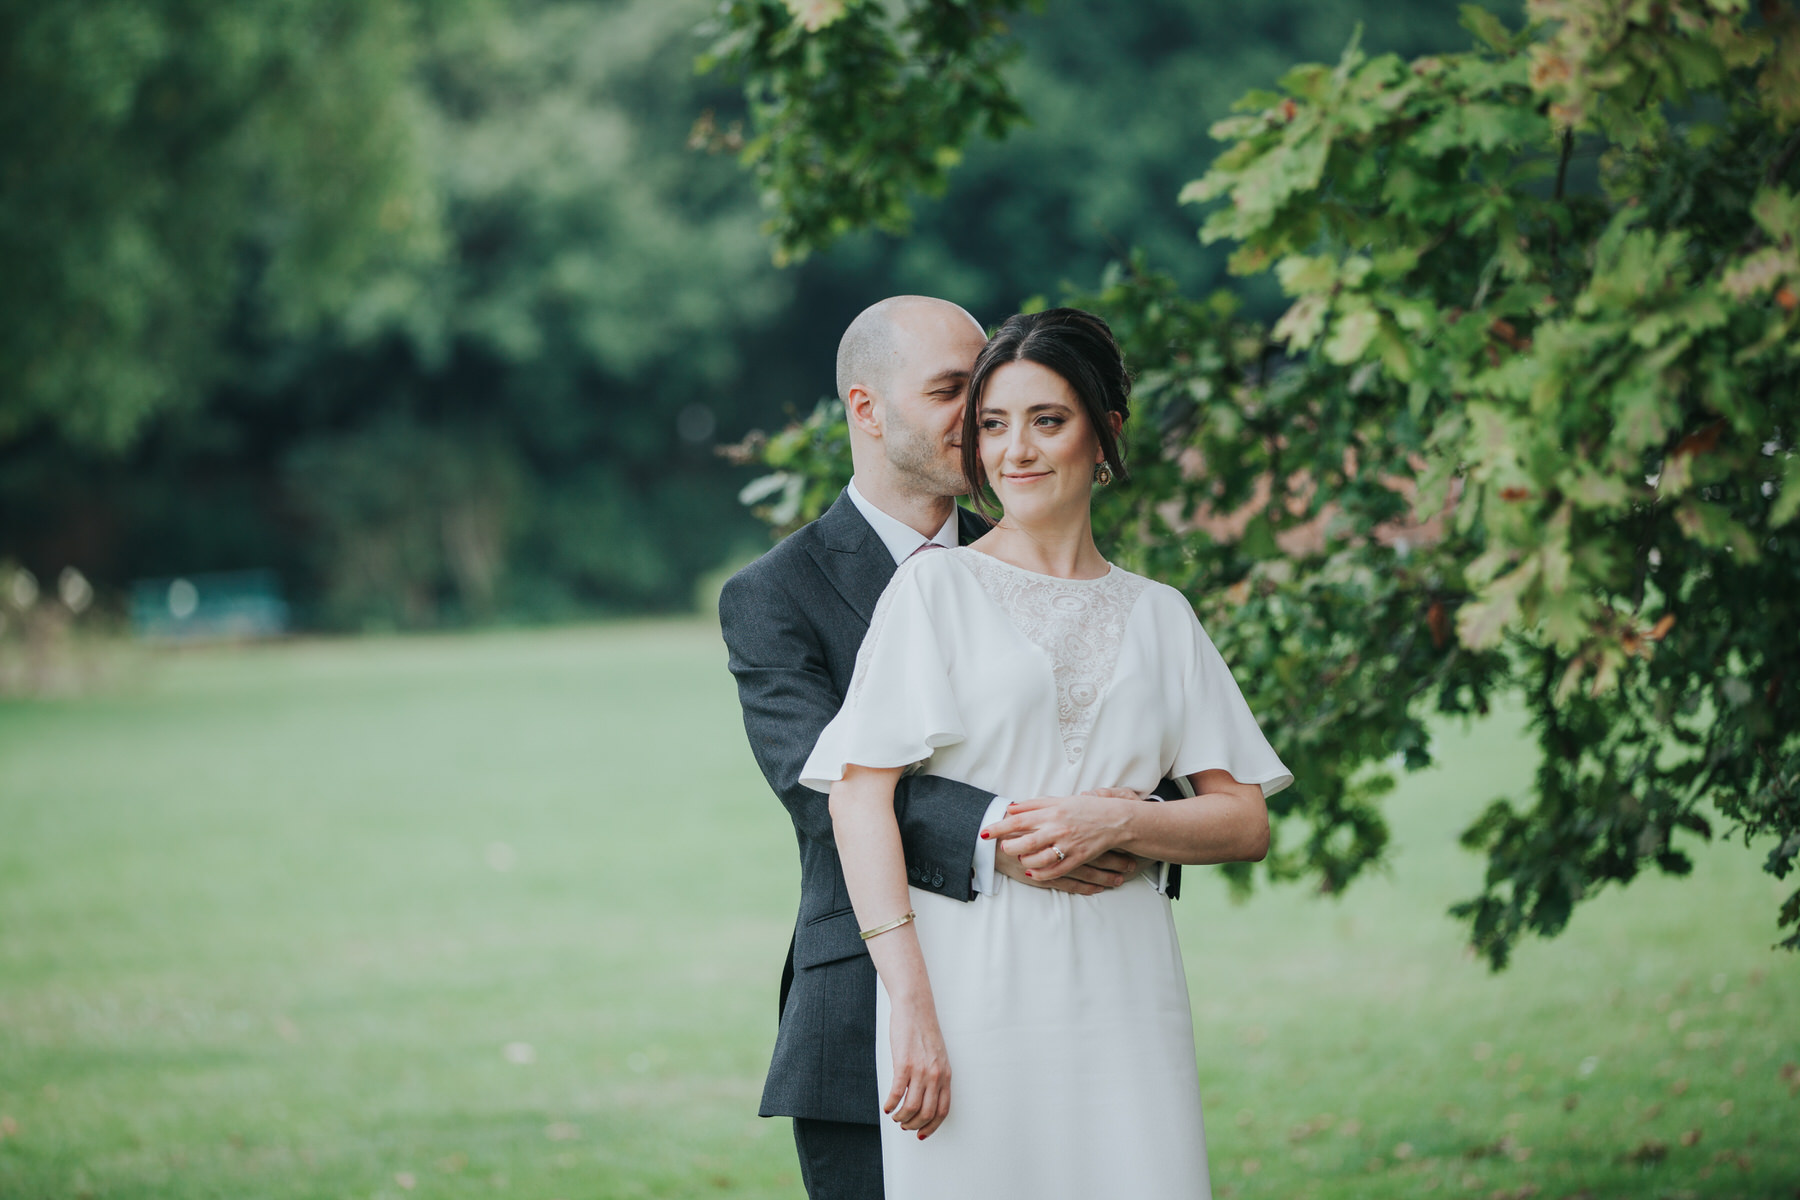 natural unposed wedding photographer London.jpg